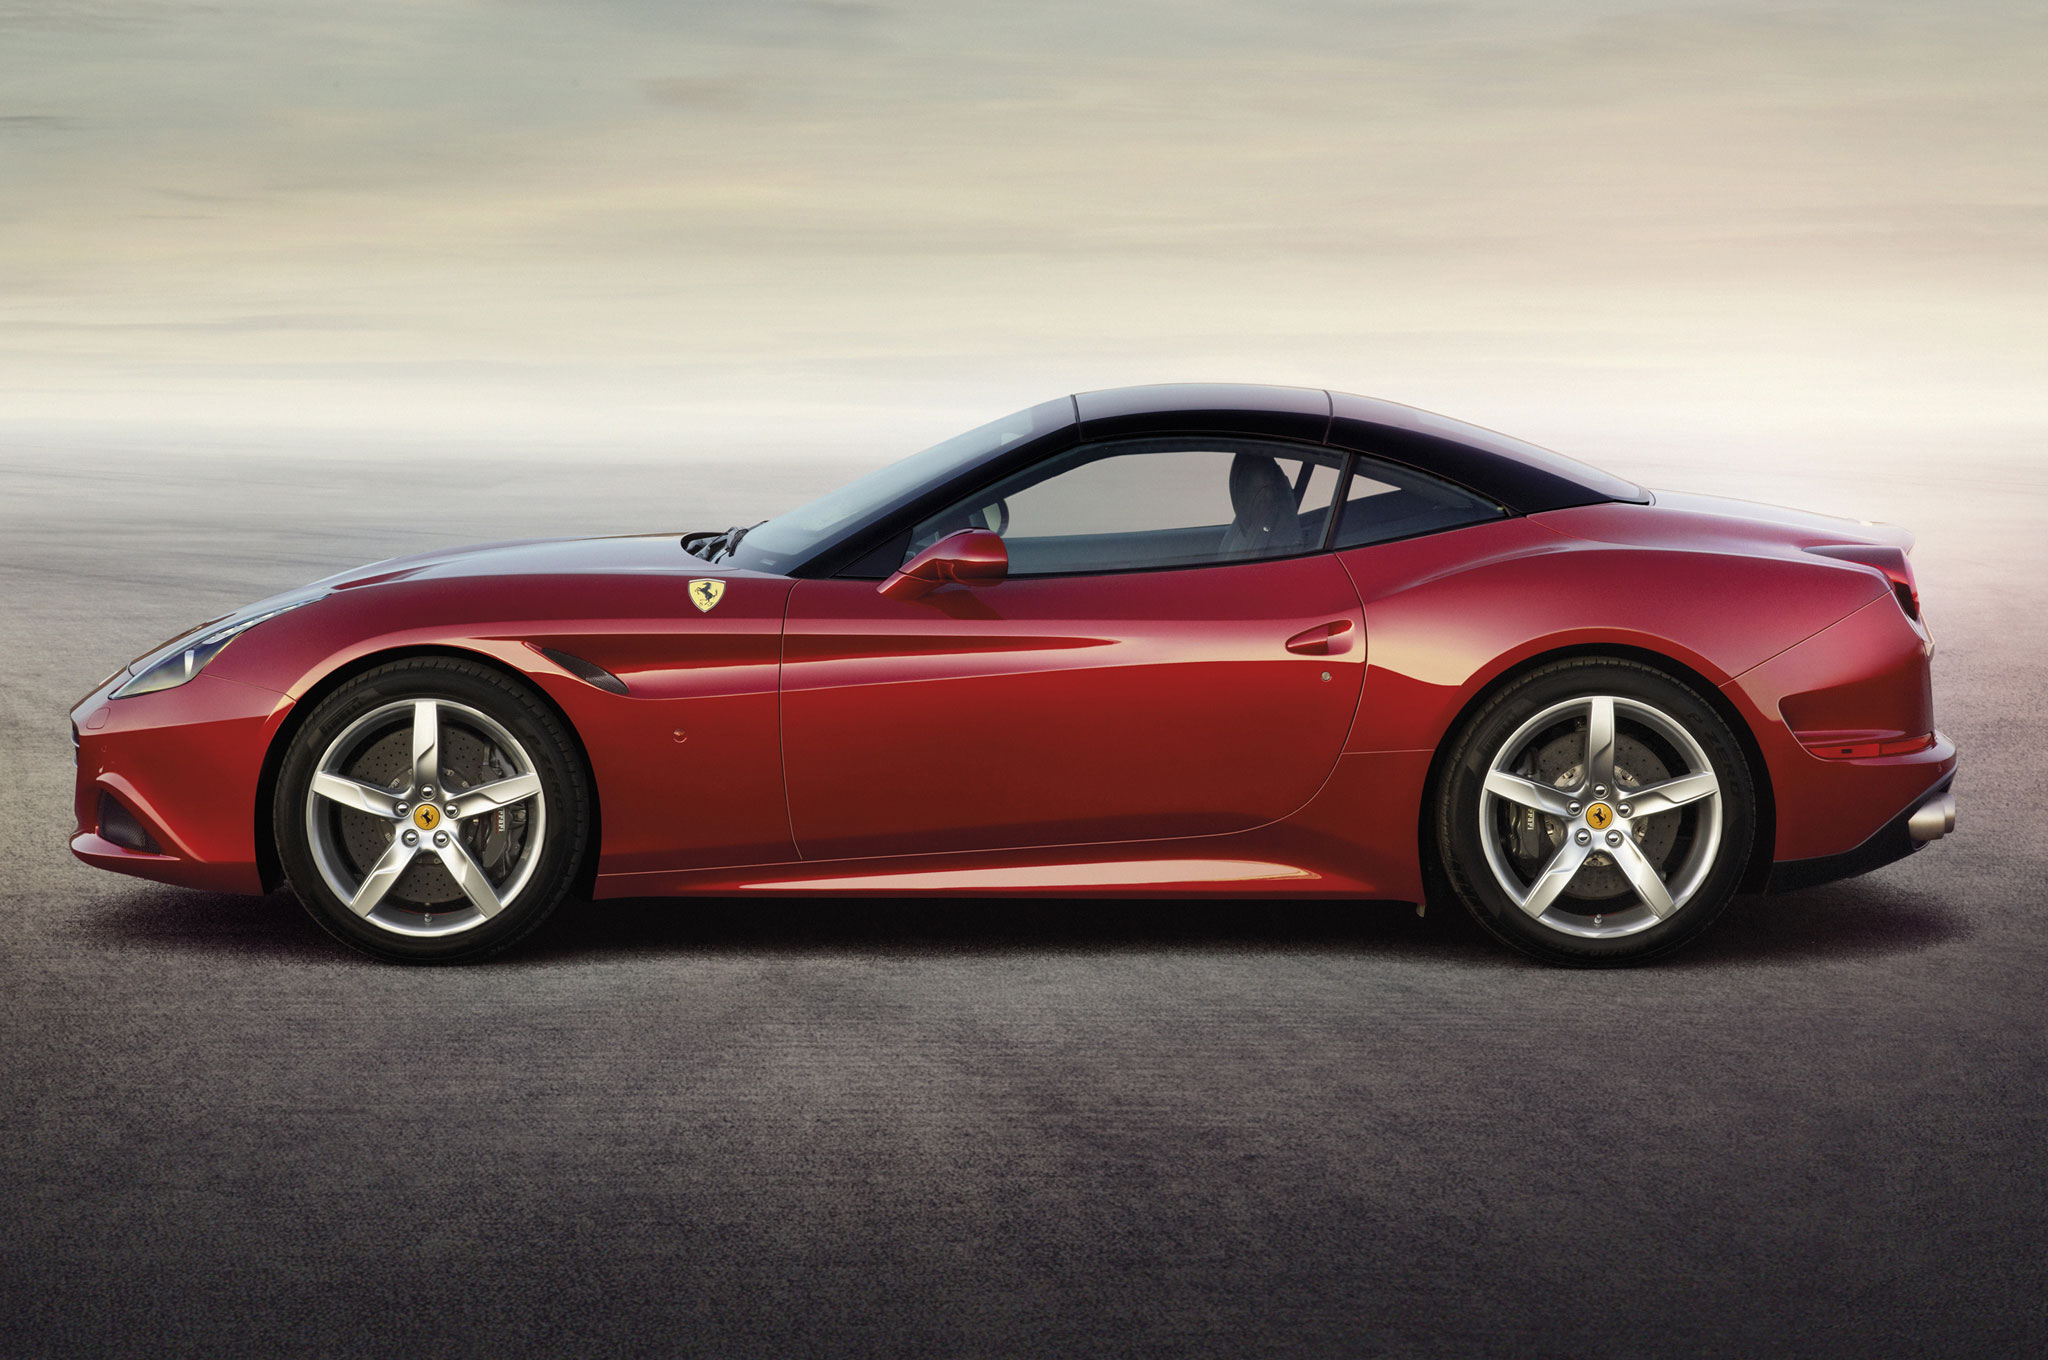 2015 Ferrari California T Review - Automobile Magazine